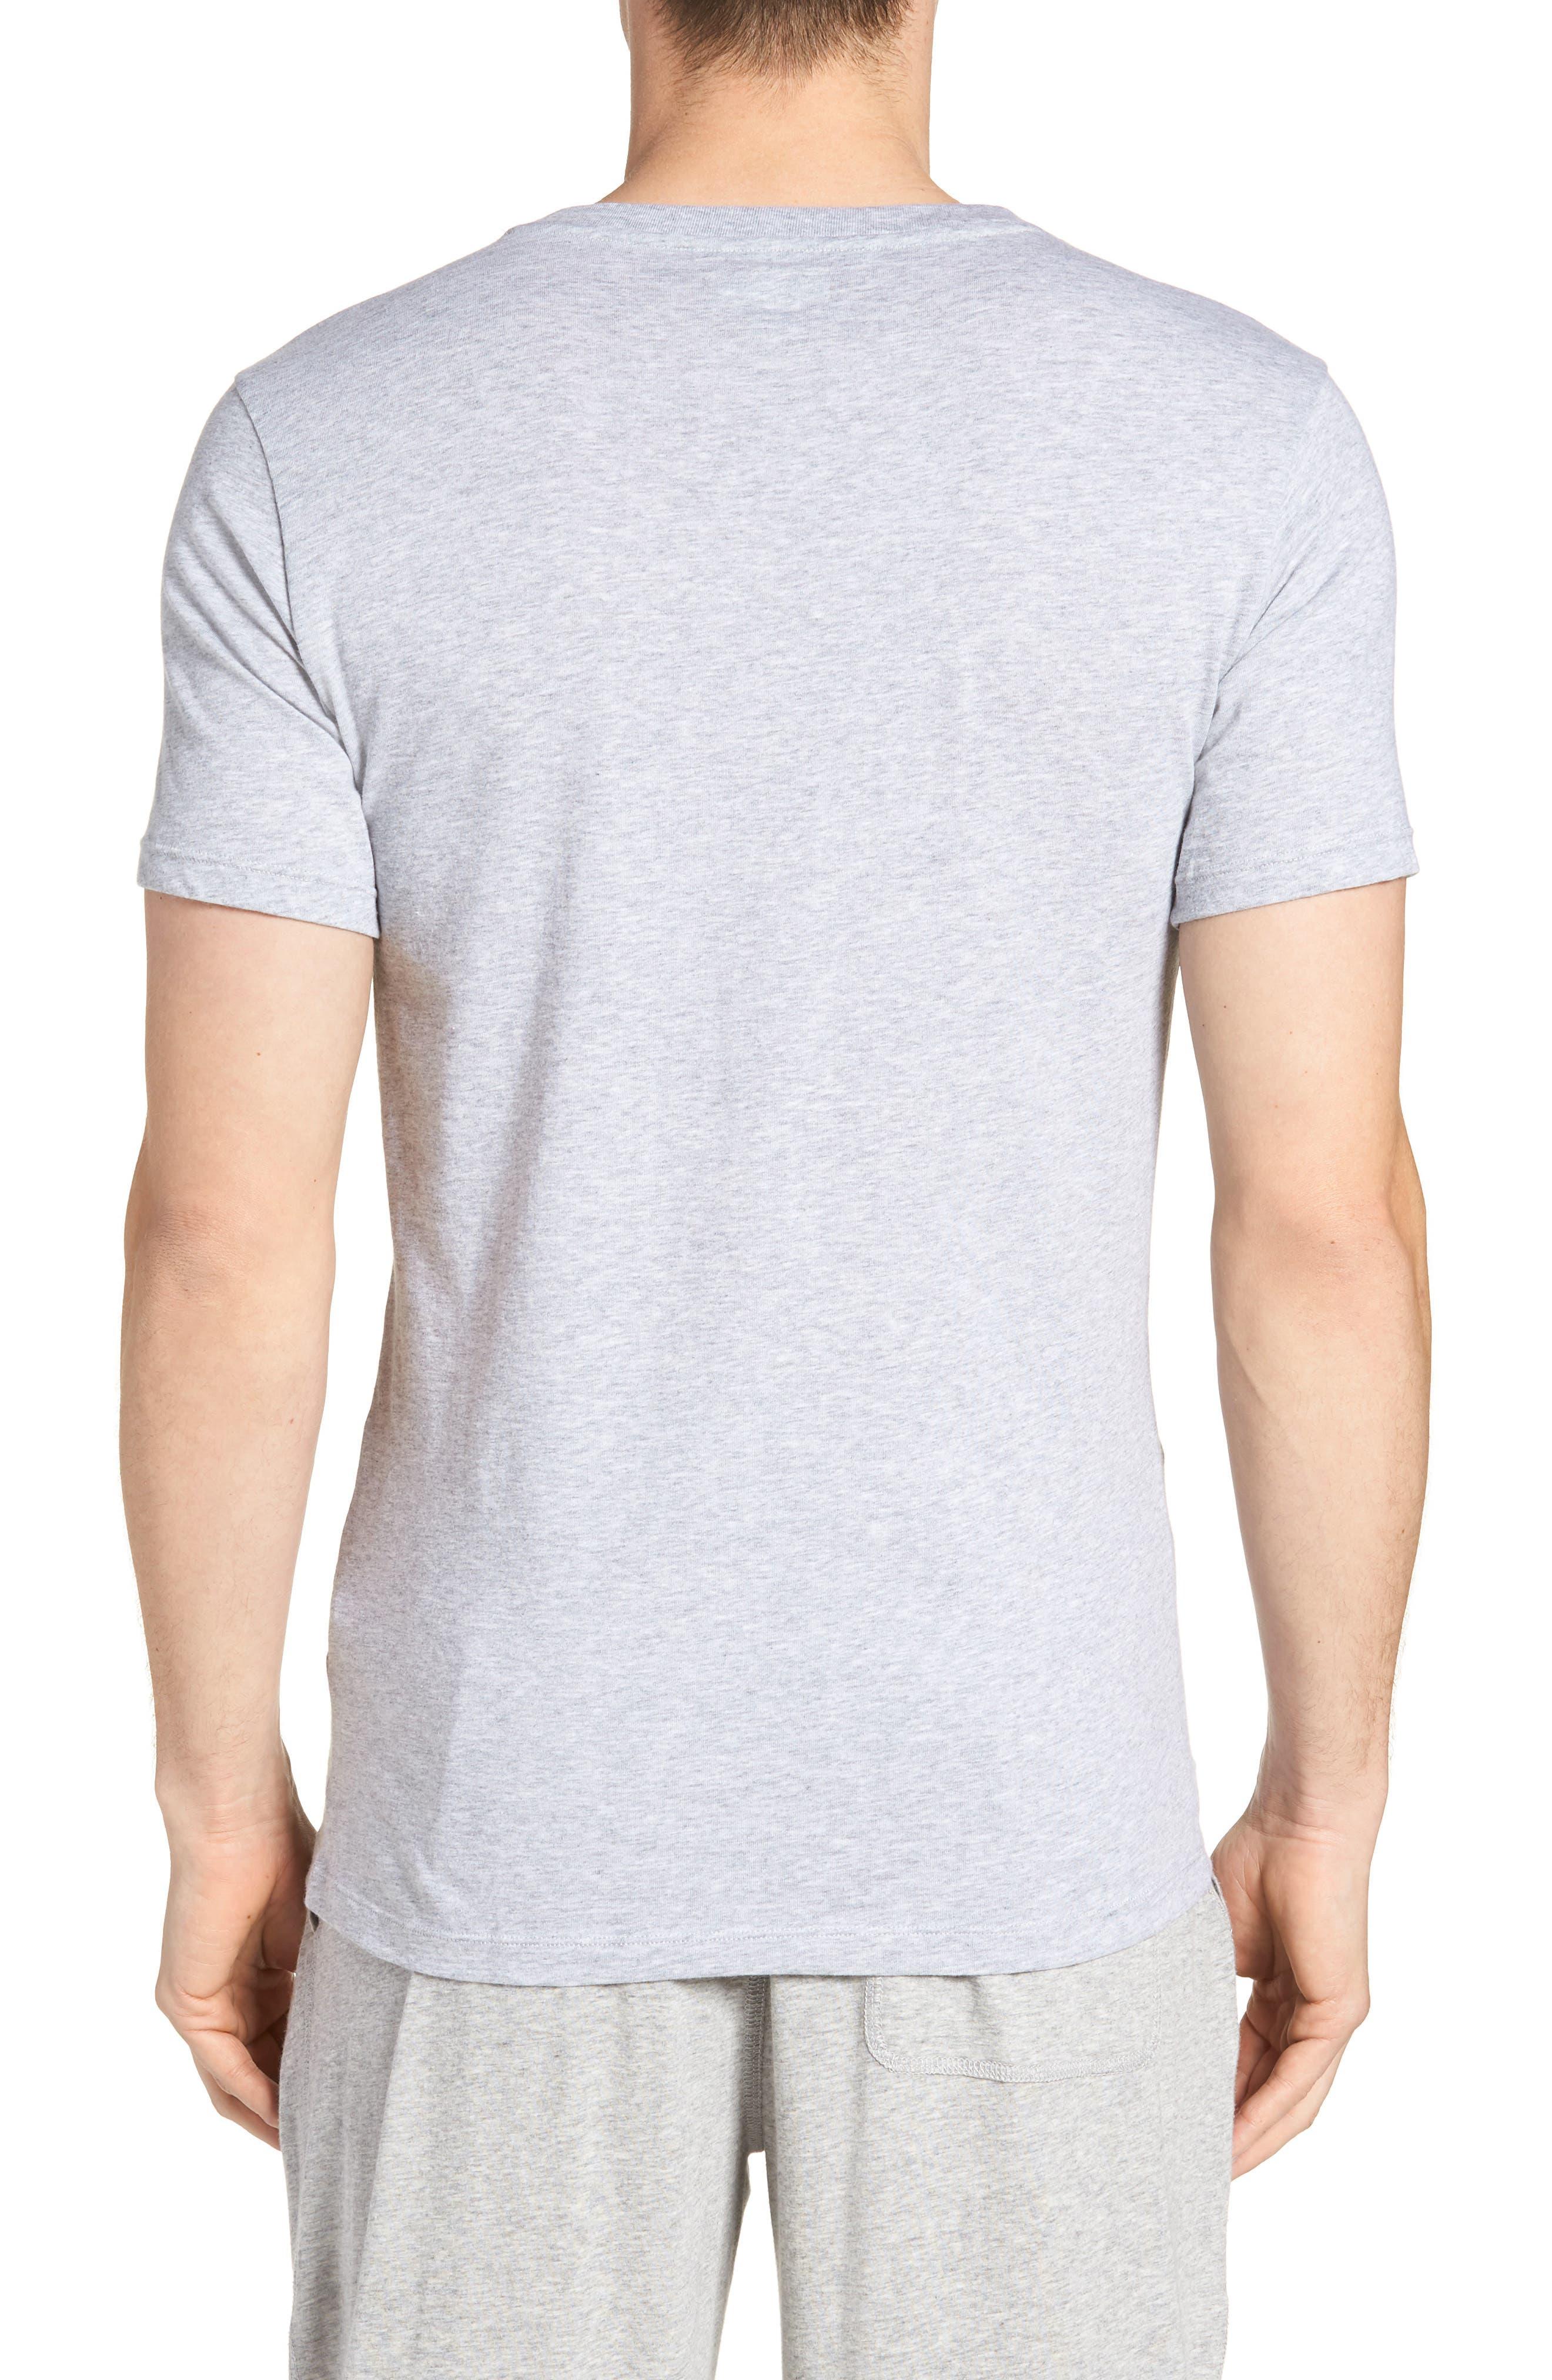 LACOSTE,                             3-Pack Slim Fit V-Neck T-Shirts,                             Alternate thumbnail 2, color,                             BLACK/ GREY/ WHITE